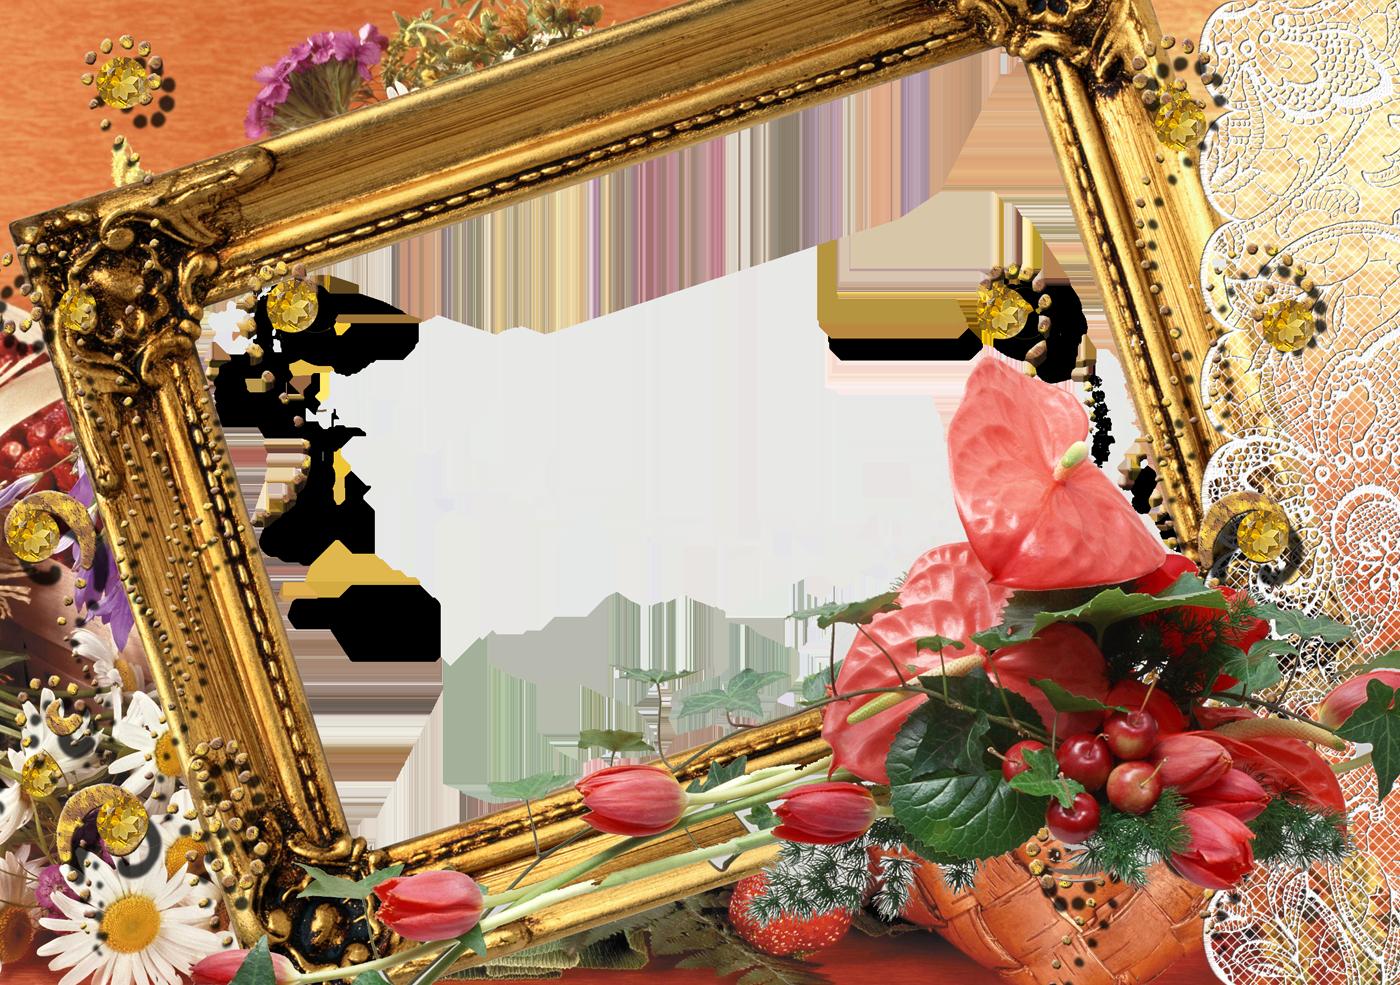 backgroundnewmarriageframeskarishmaframes background album 1400x985